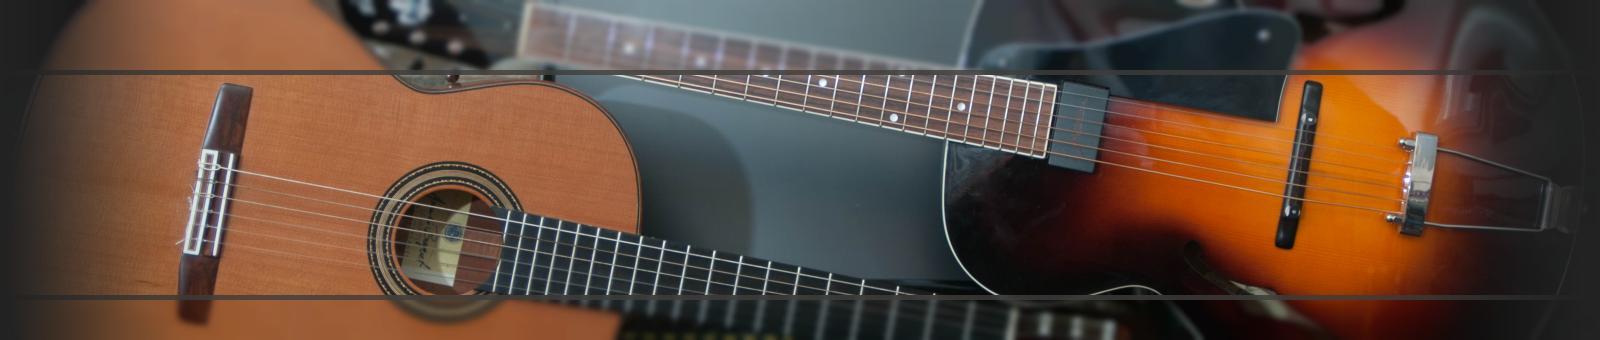 Gitarrenunterricht Köln - Gitarrenlehrer Köln